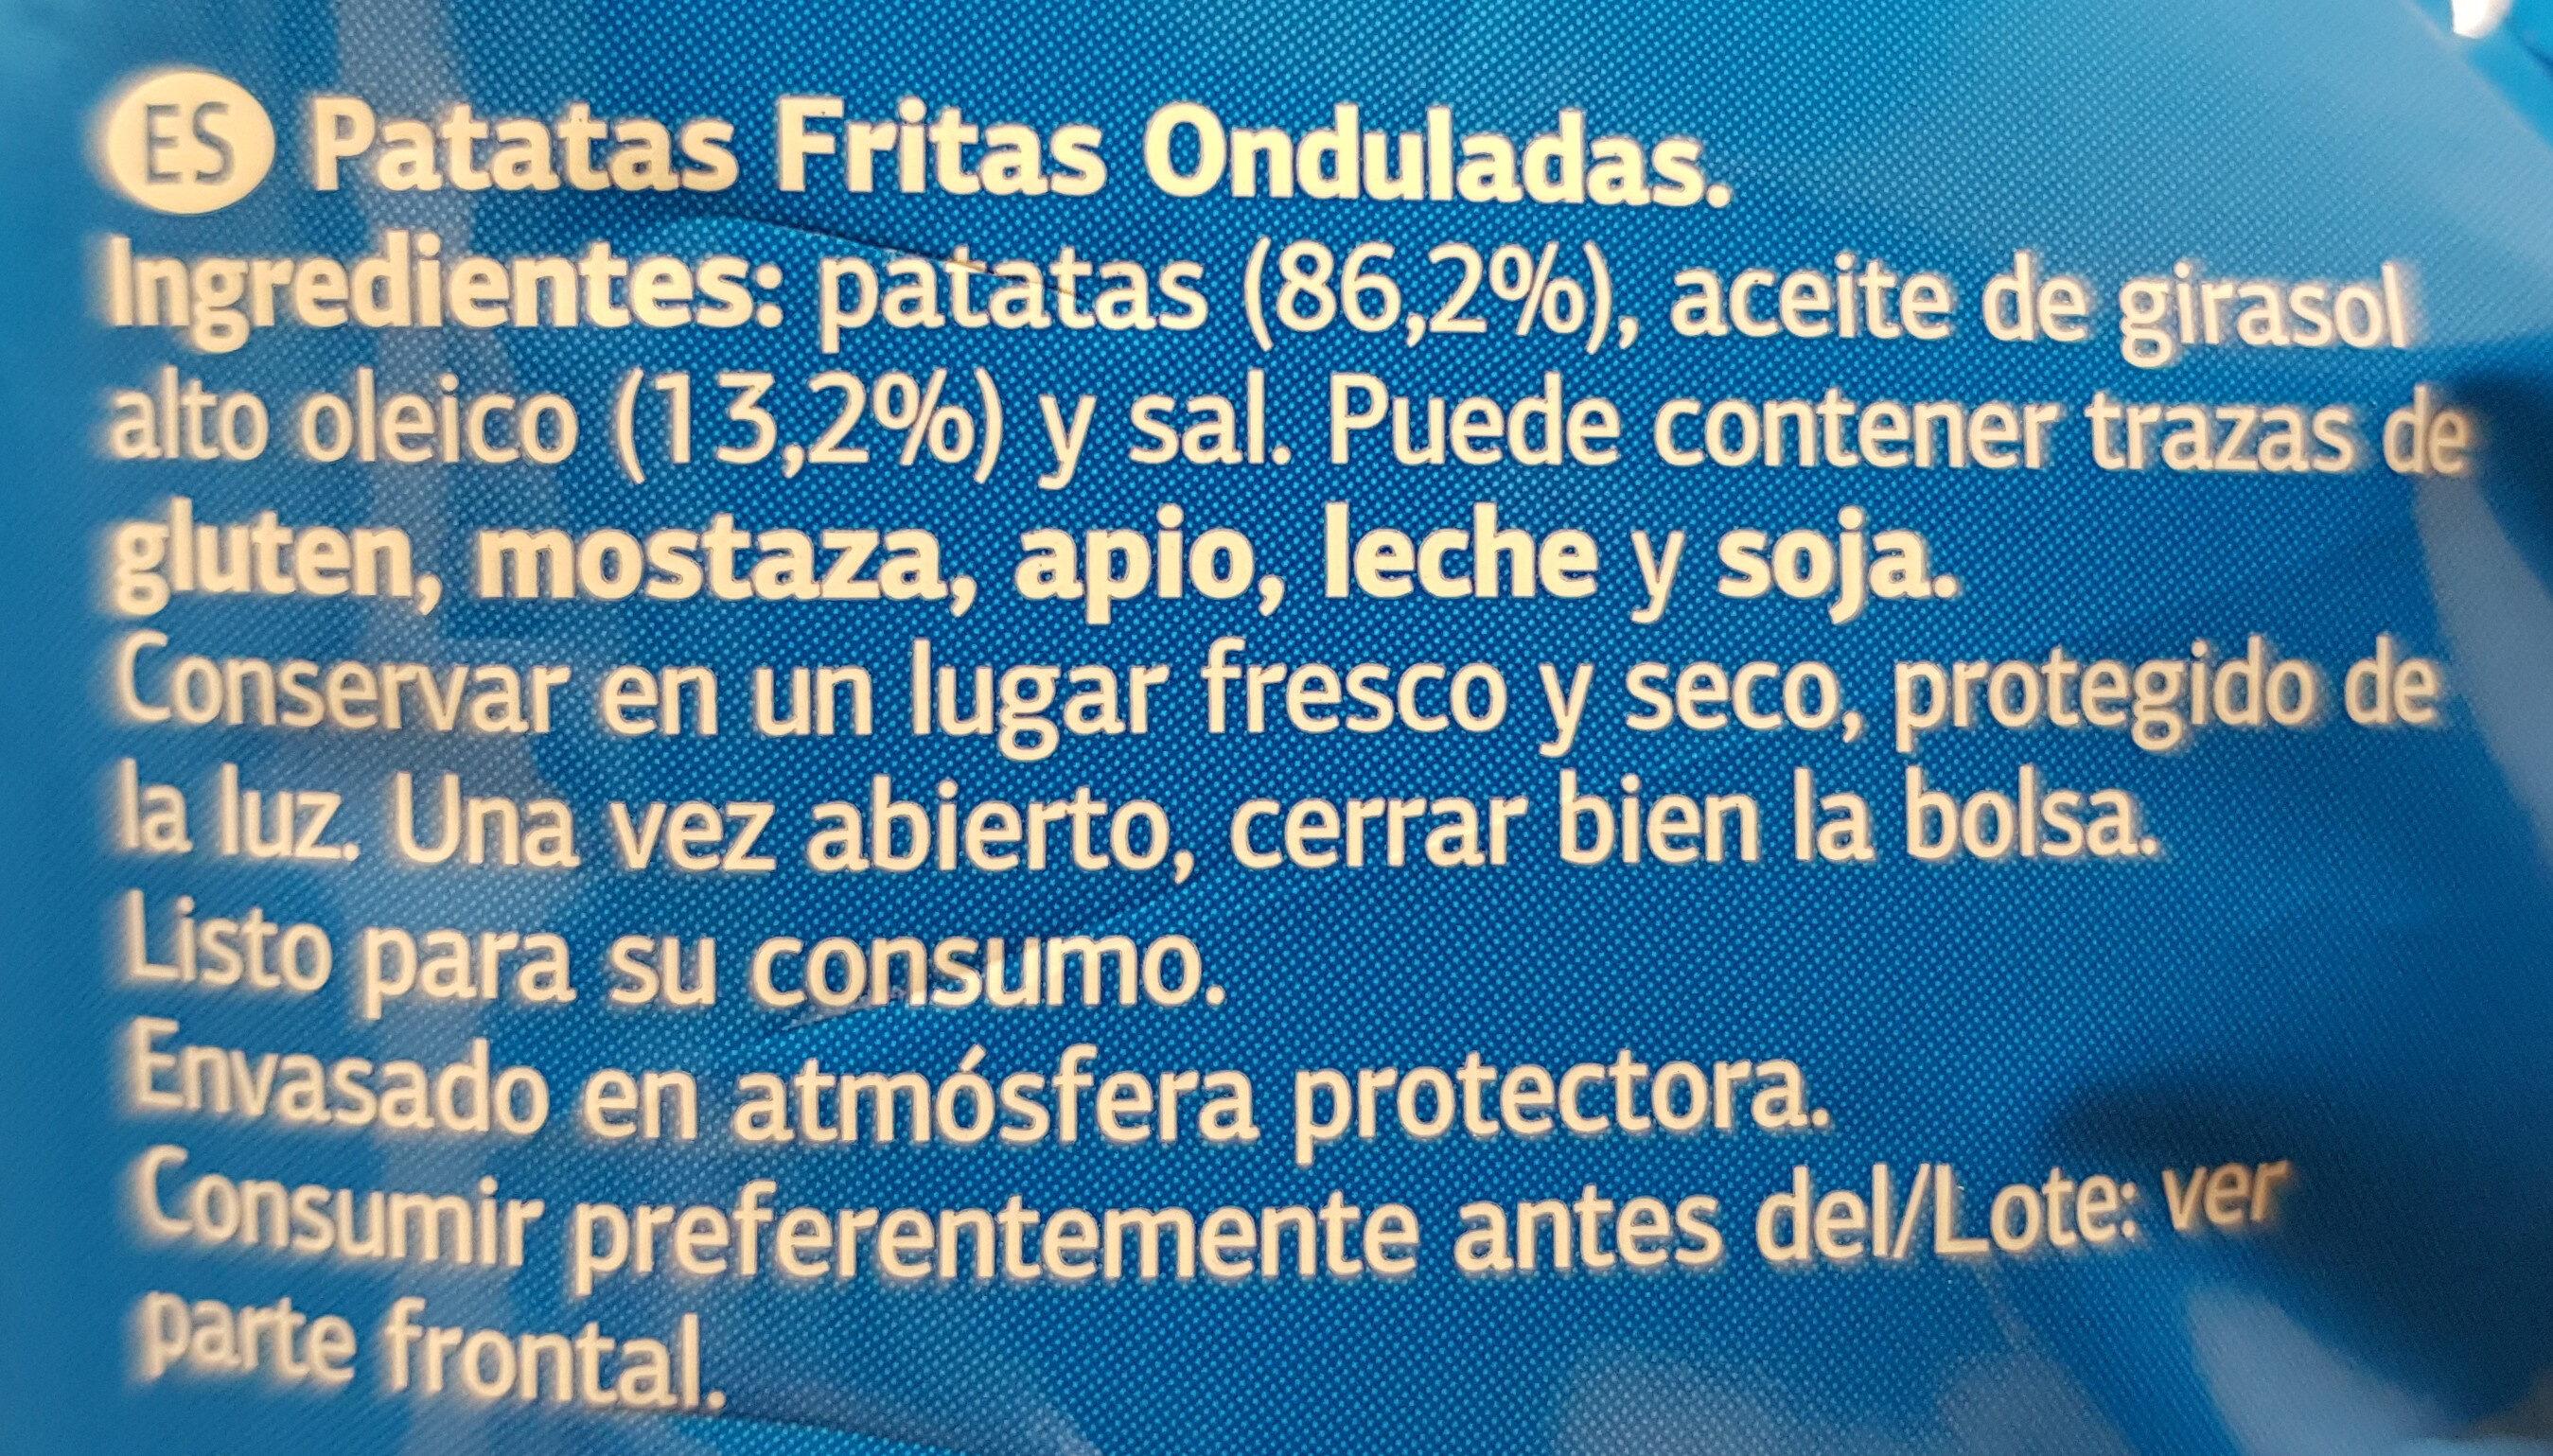 Patatas Fritas Onduladas - Ingredients - es